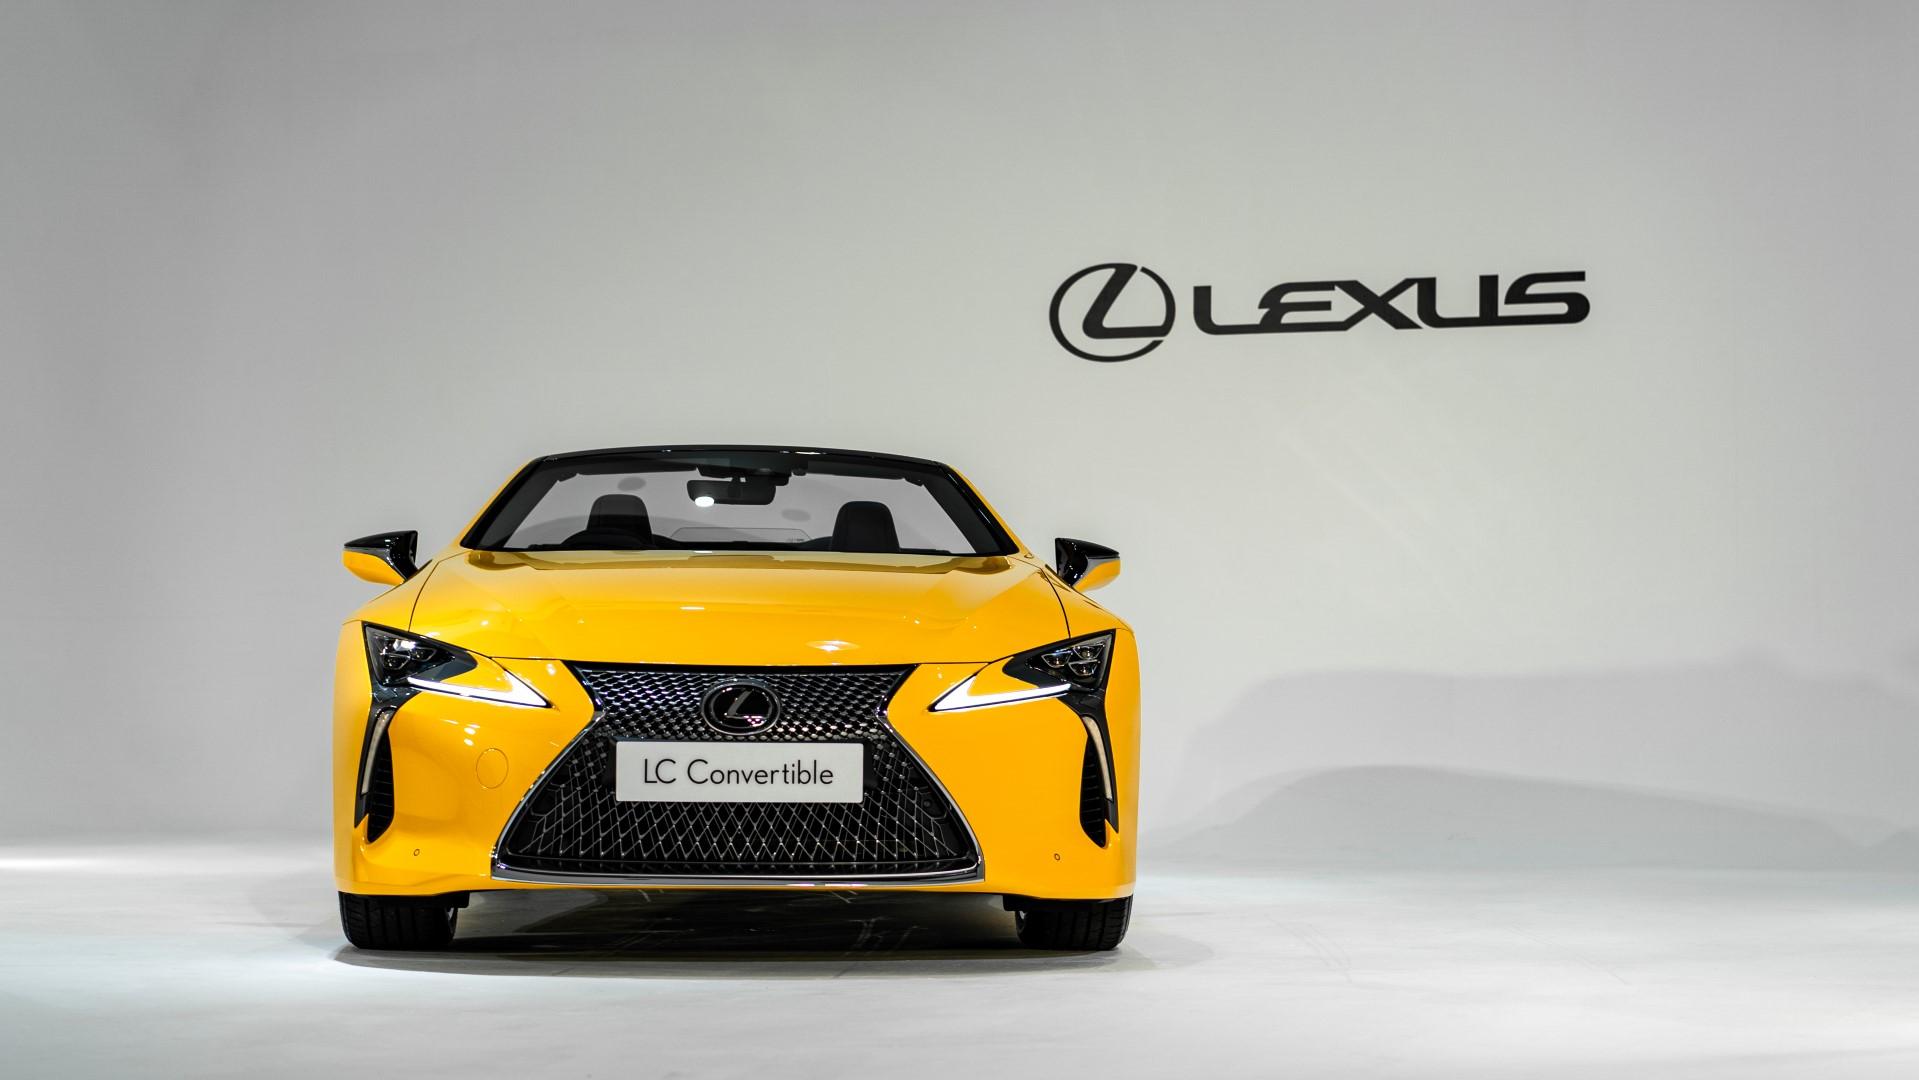 2020 Lexus LC 500 Convertible front